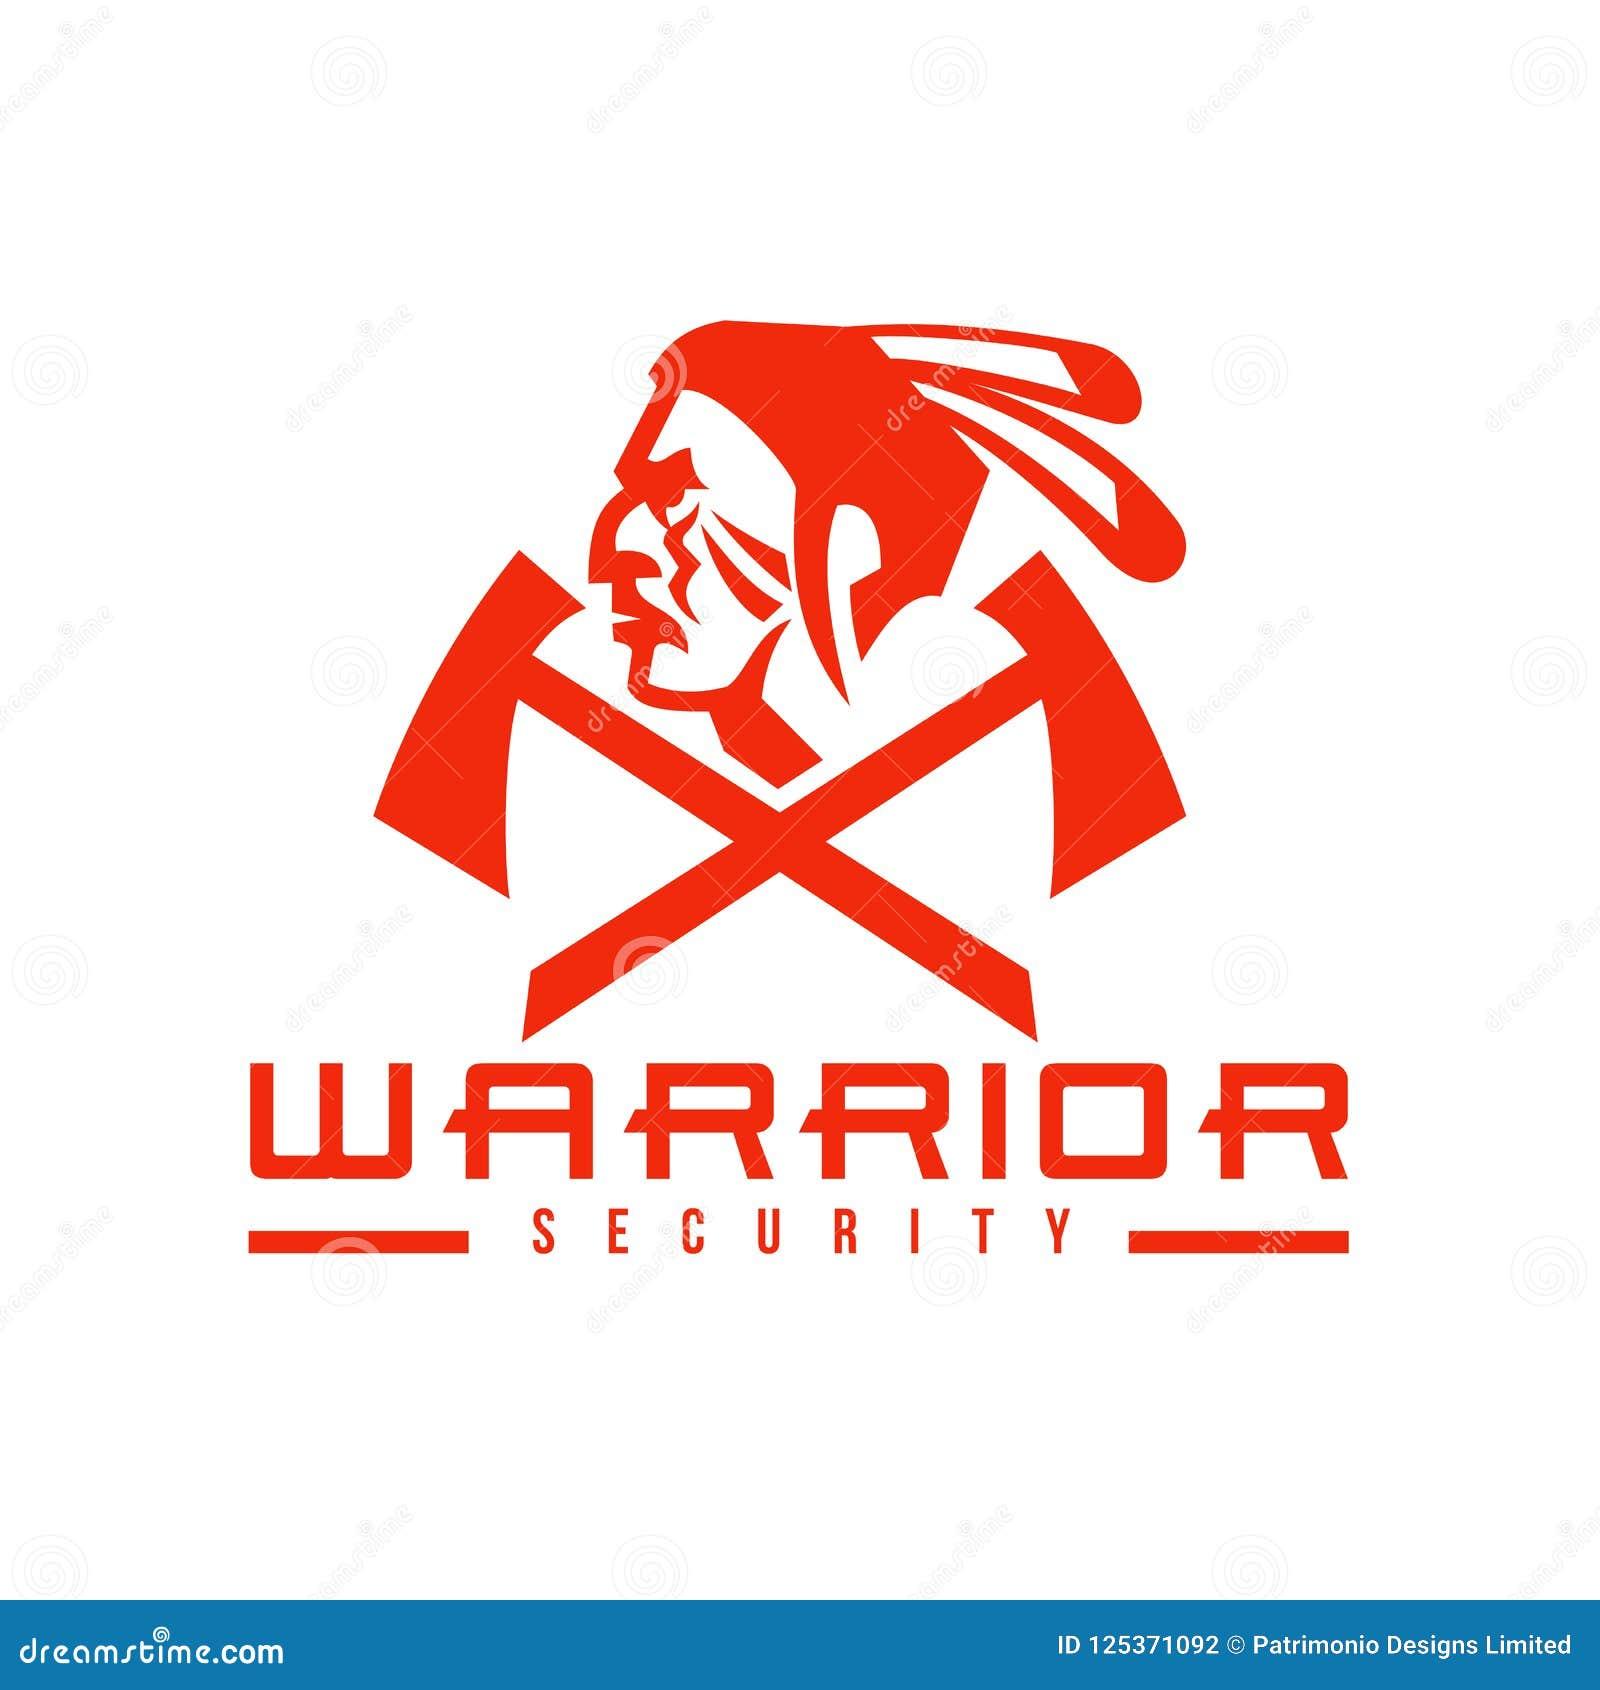 Native American Warrior Security Mascot Stock Illustration